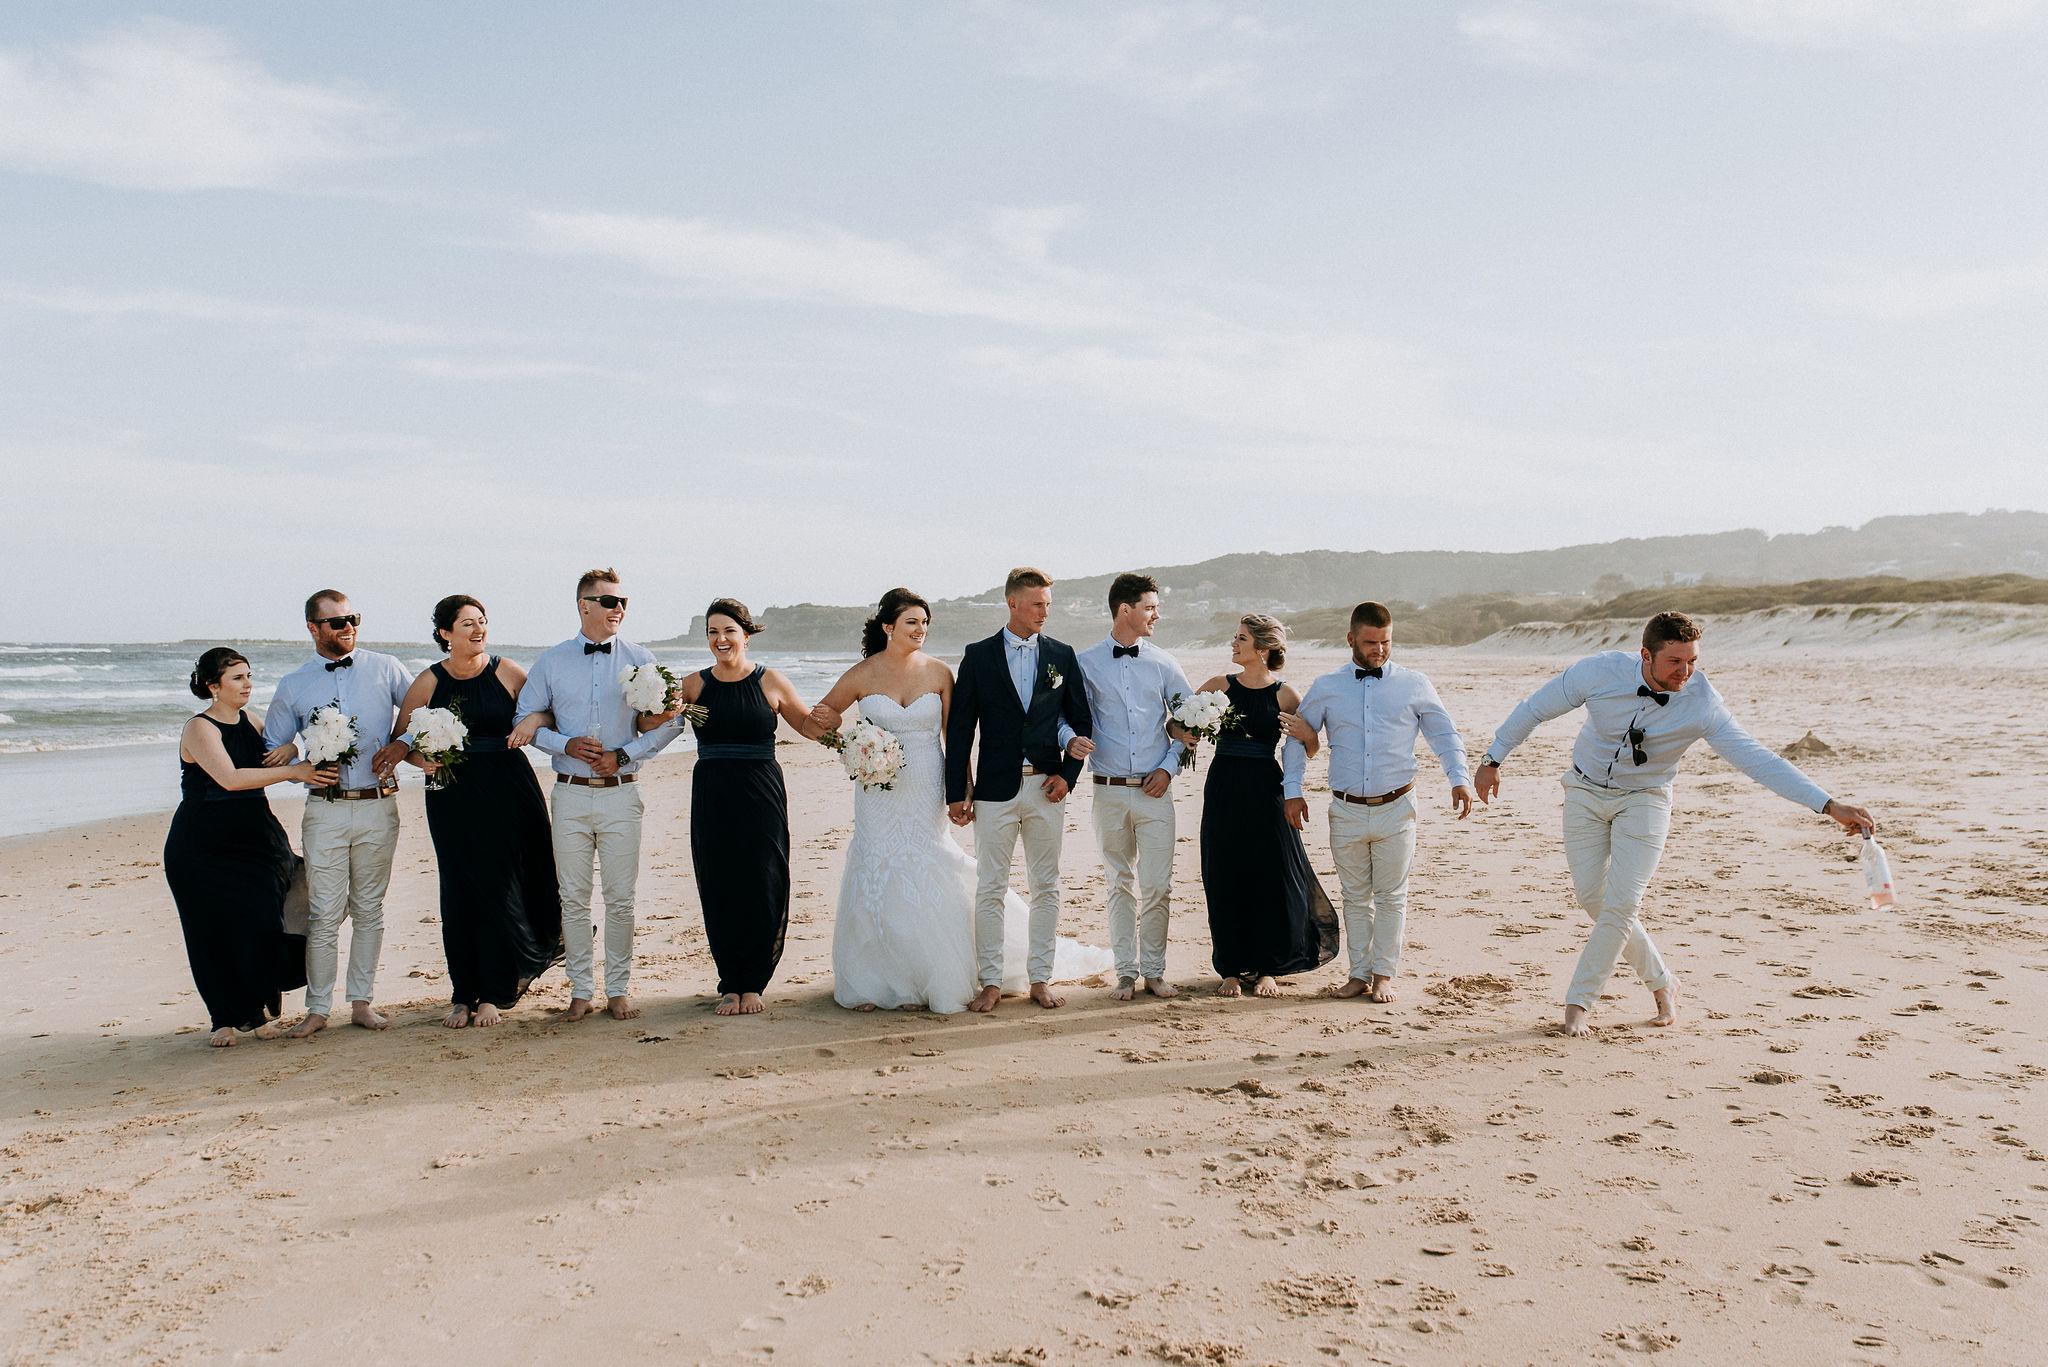 CAVES-BEACH-HOTEL-WEDDING-PATTEN-937.jpg